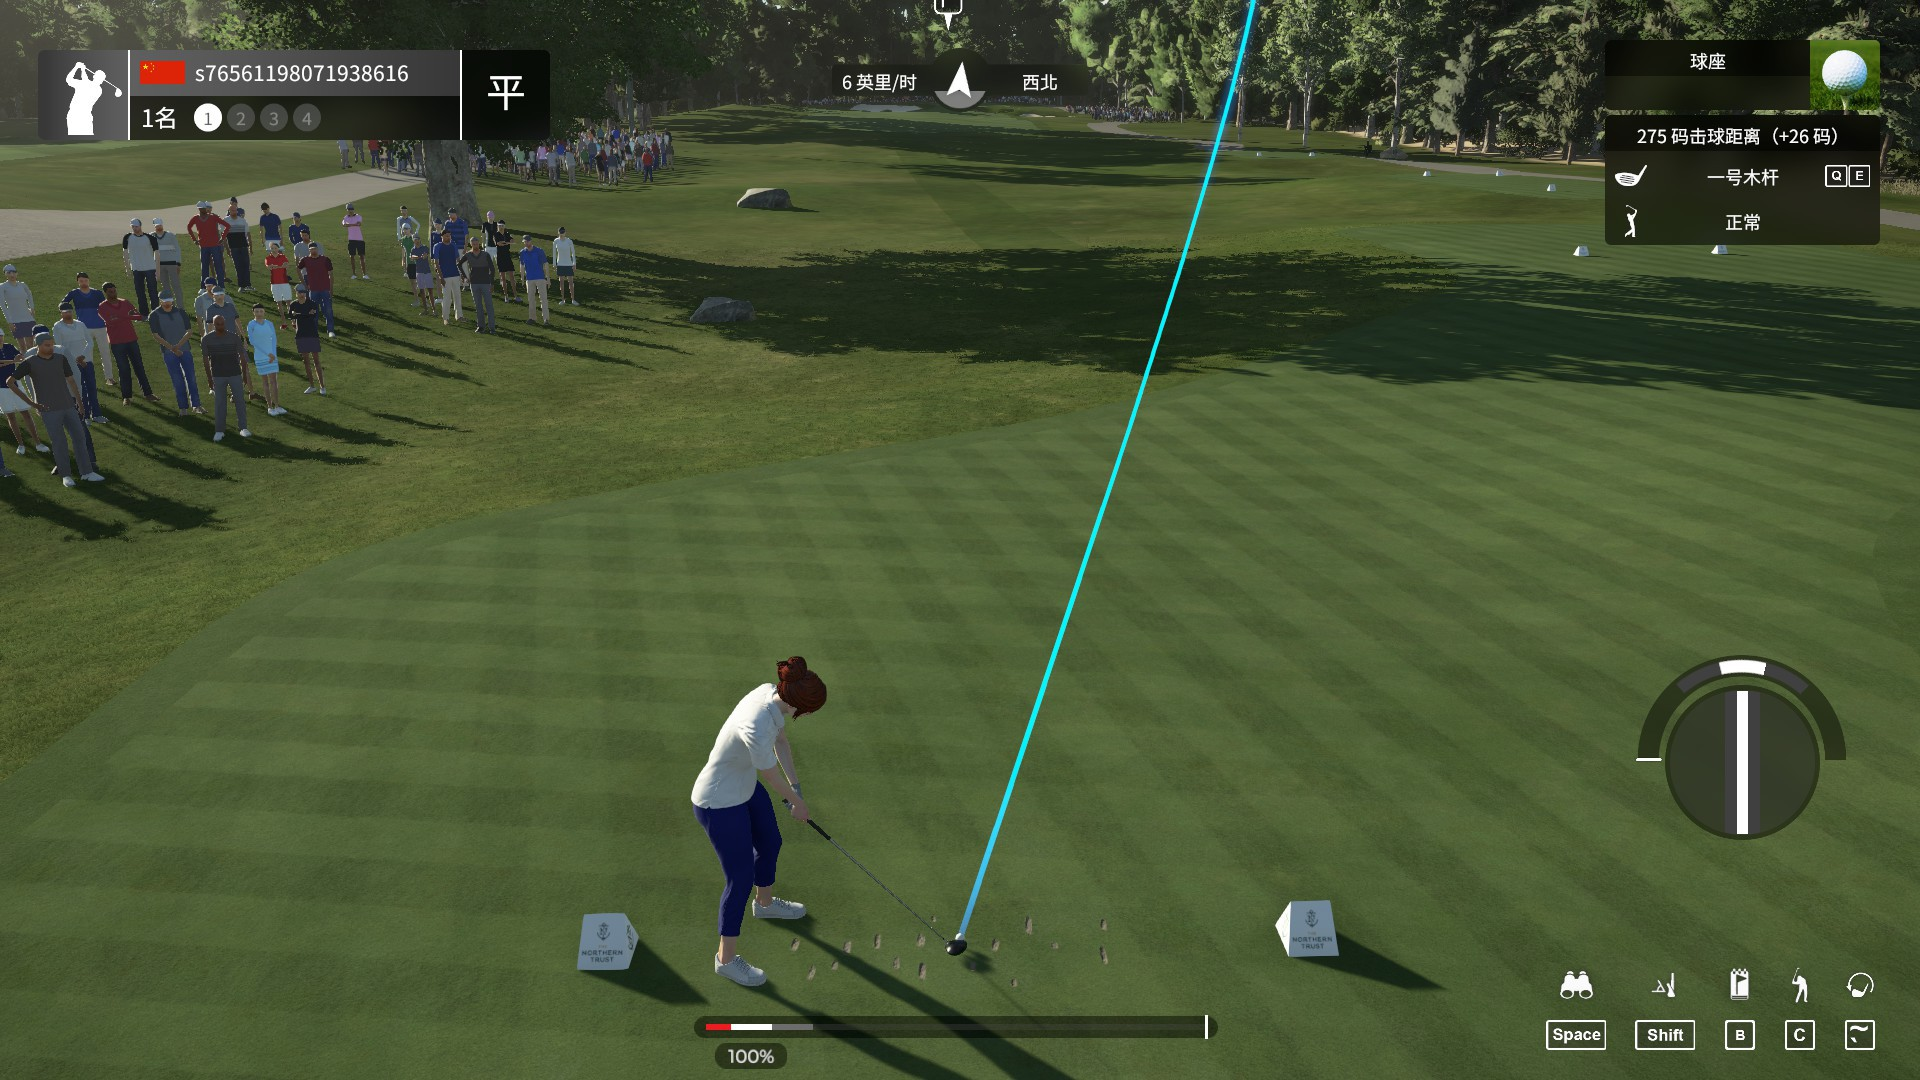 《PGA巡回赛2K21》评测:黄金年代的巨人